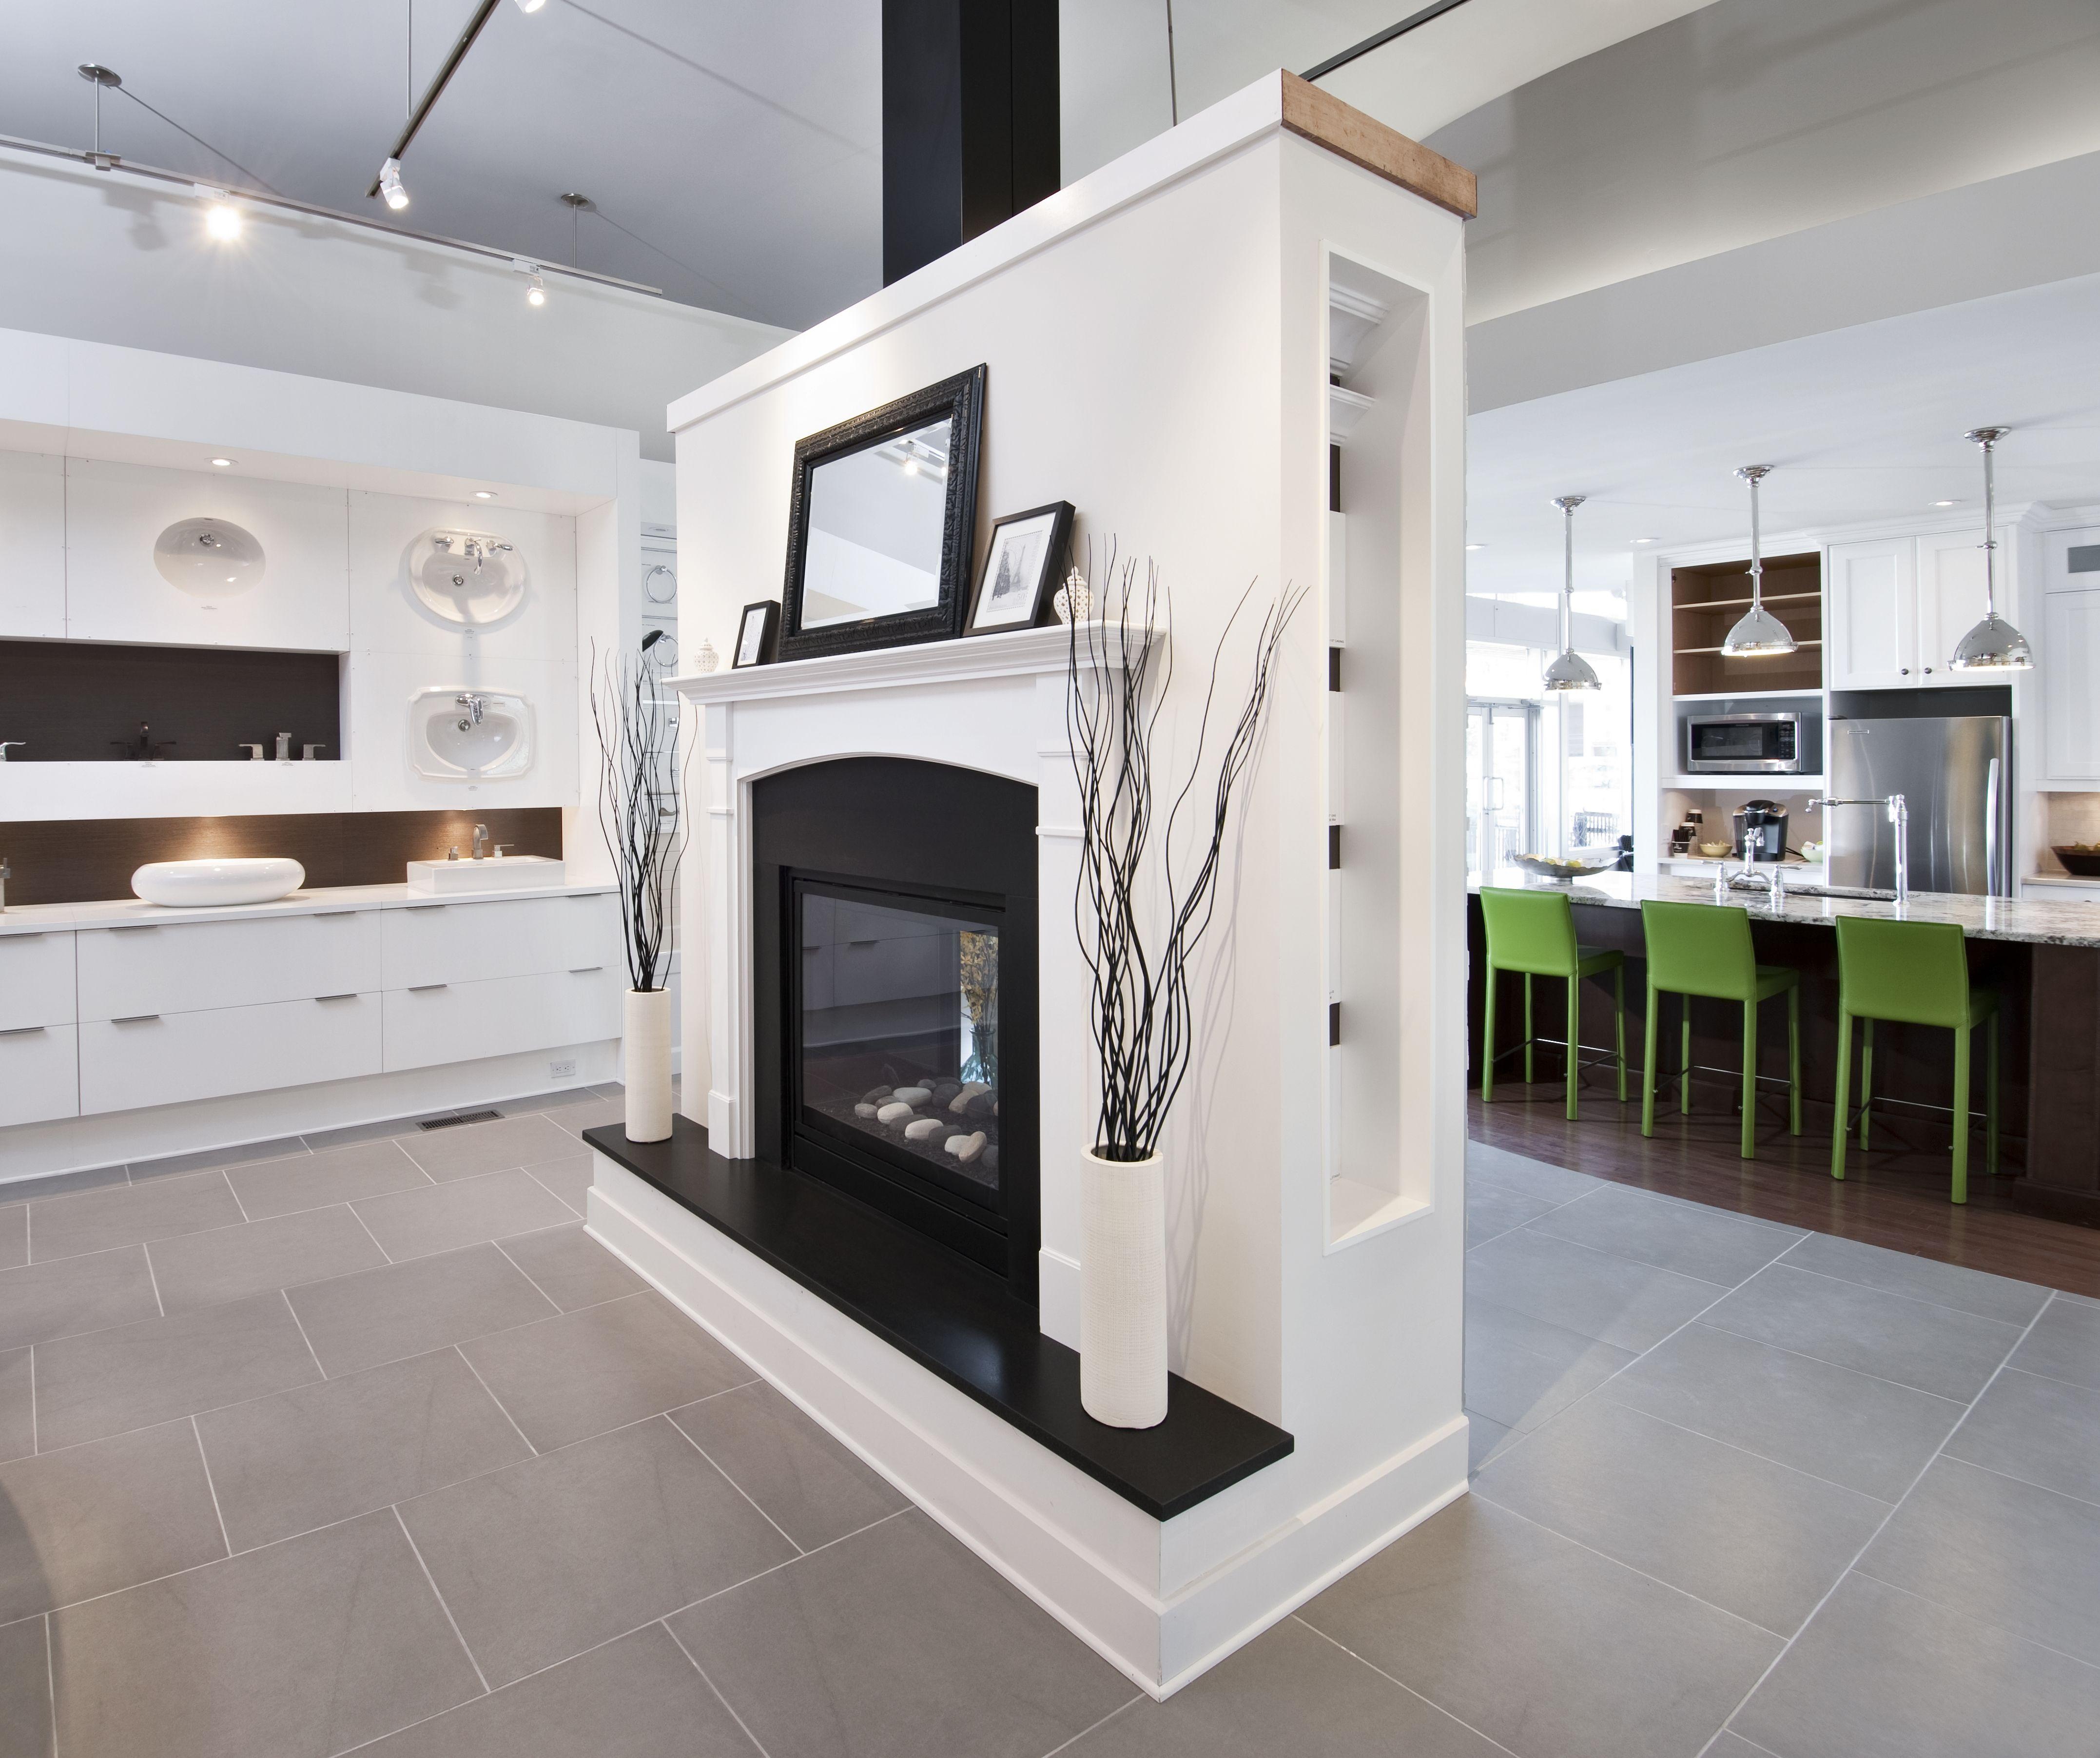 Beautiful Inspirations Home Design Center Images - Decoration Design ...